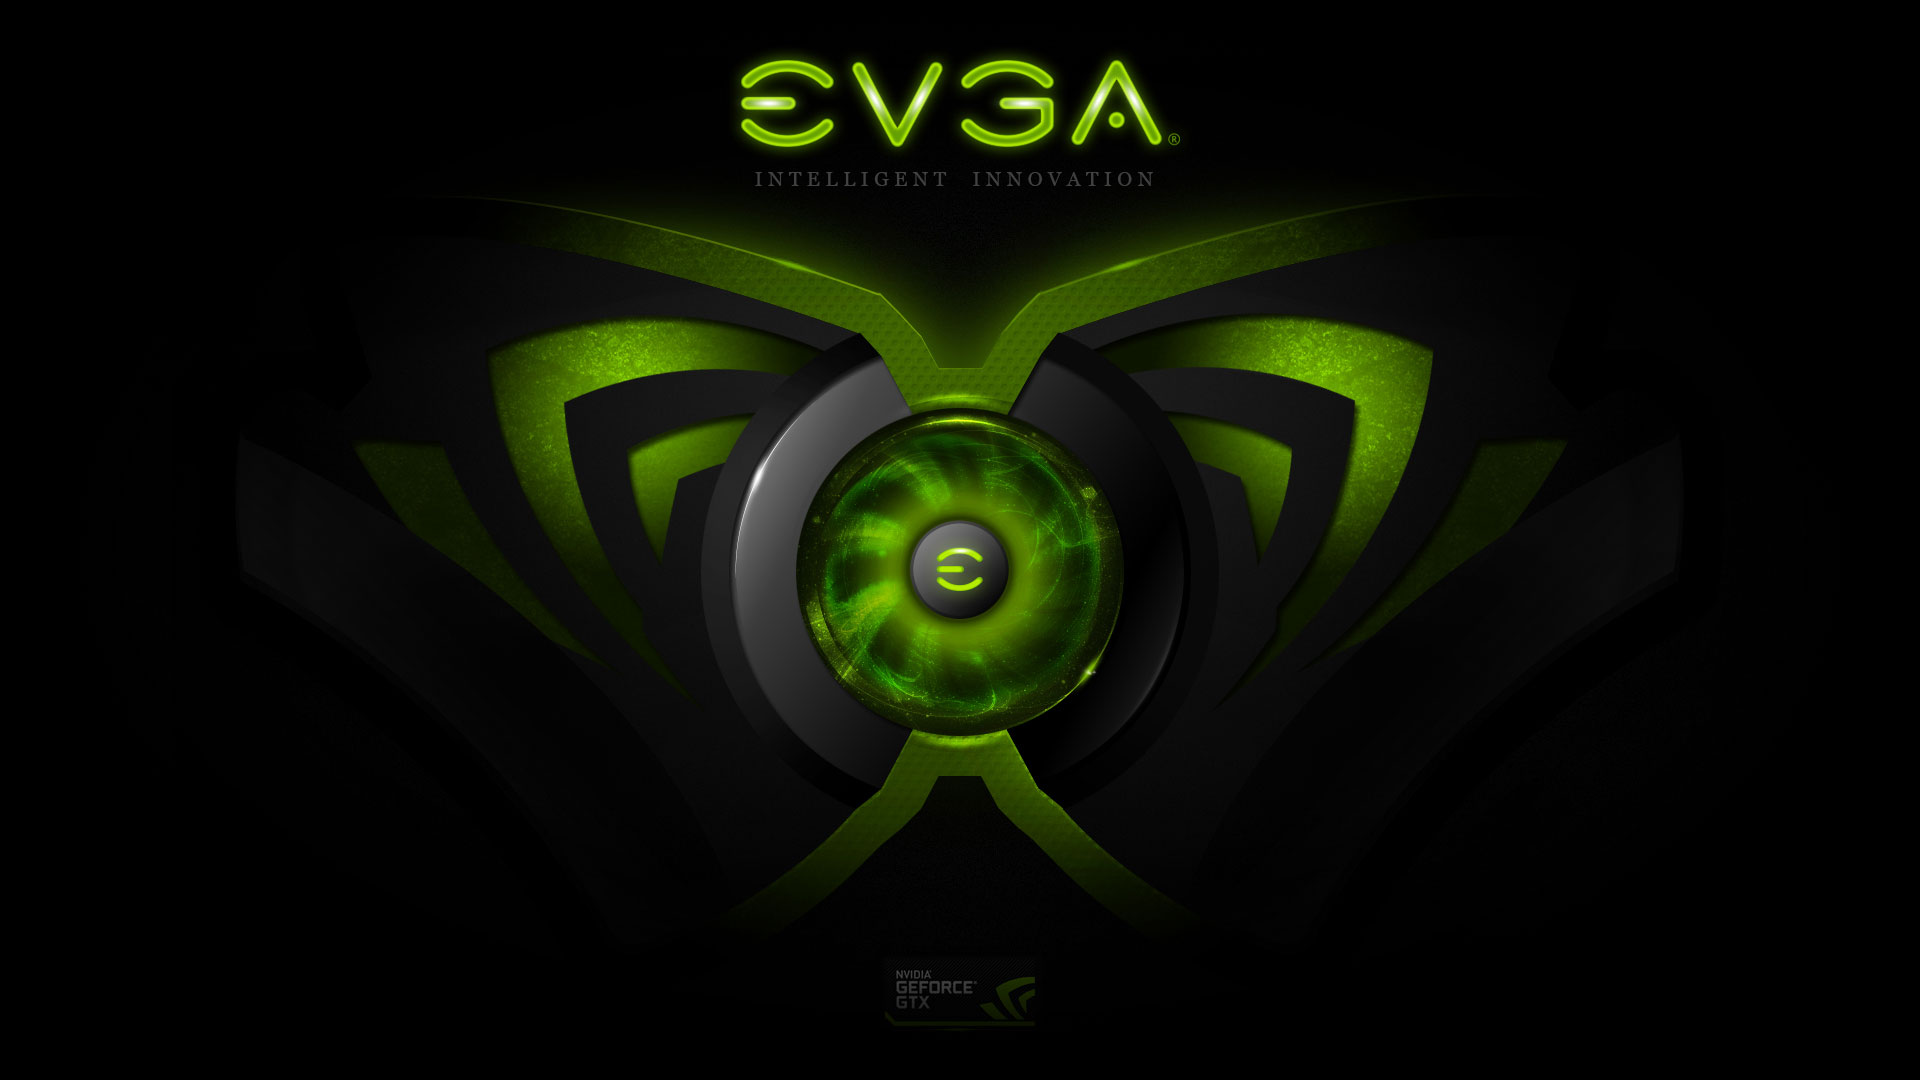 Nvidia full hd wallpaper and background image 1920x1080 - 1920x1080 wallpaper nvidia ...